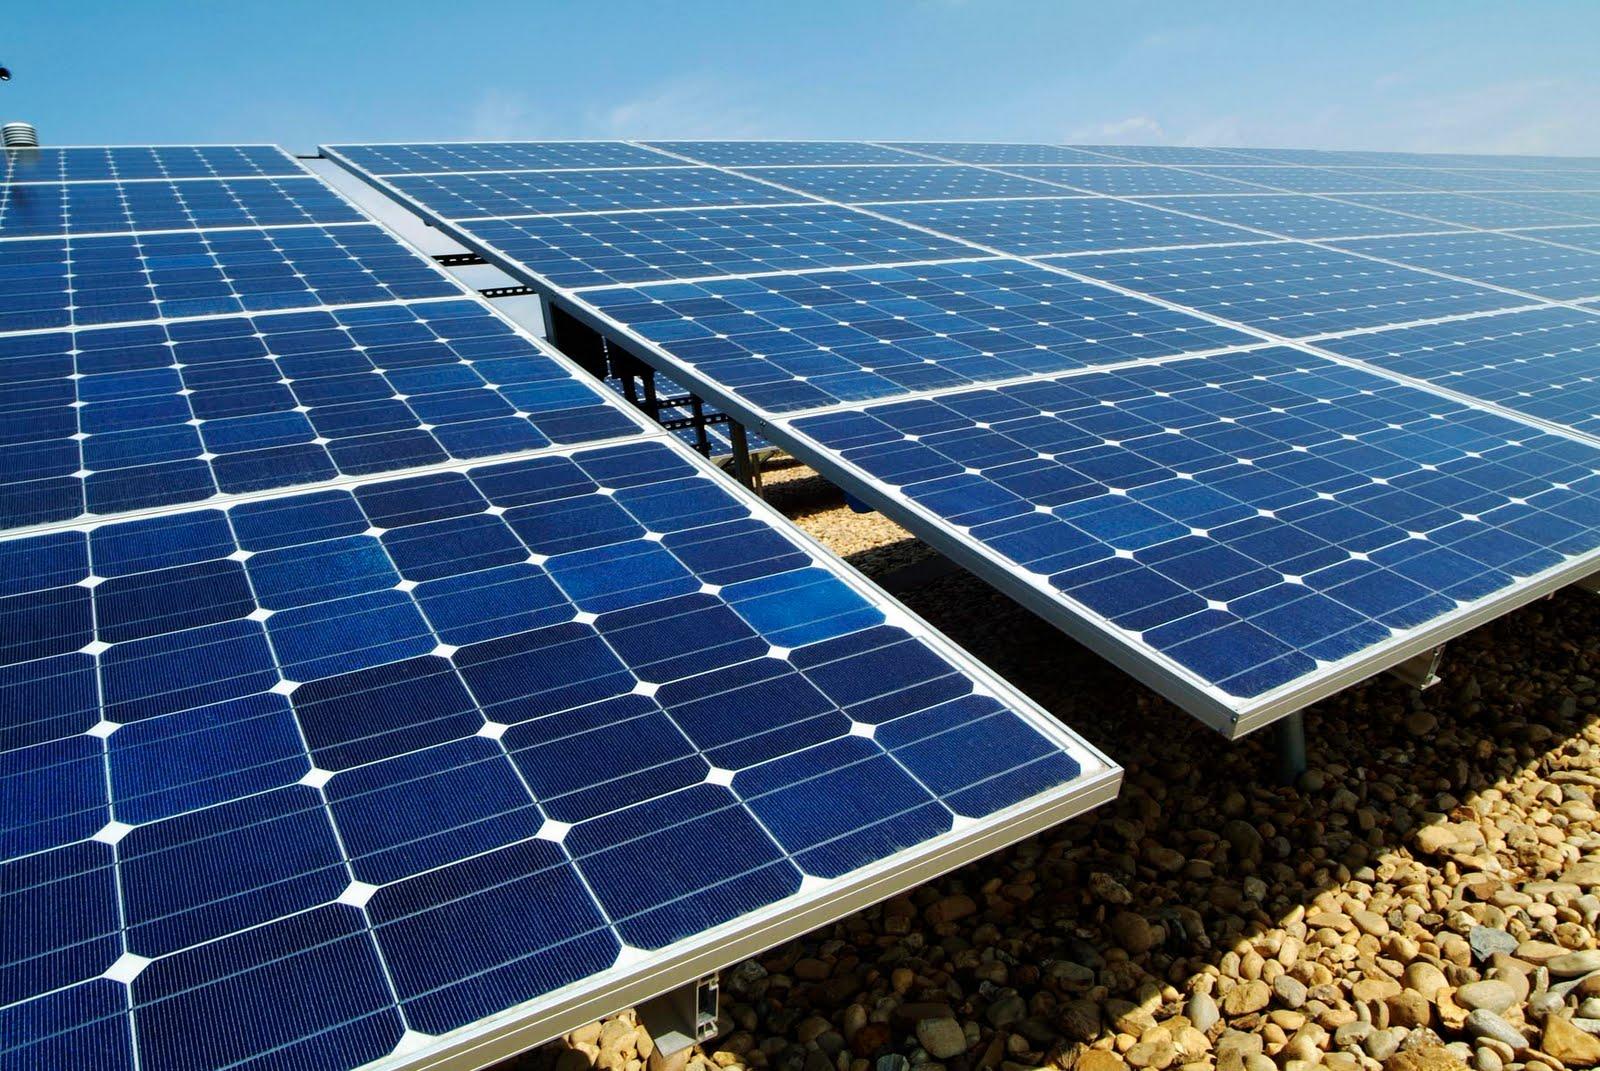 energia-solar-vantagens-e-desvantagens-1